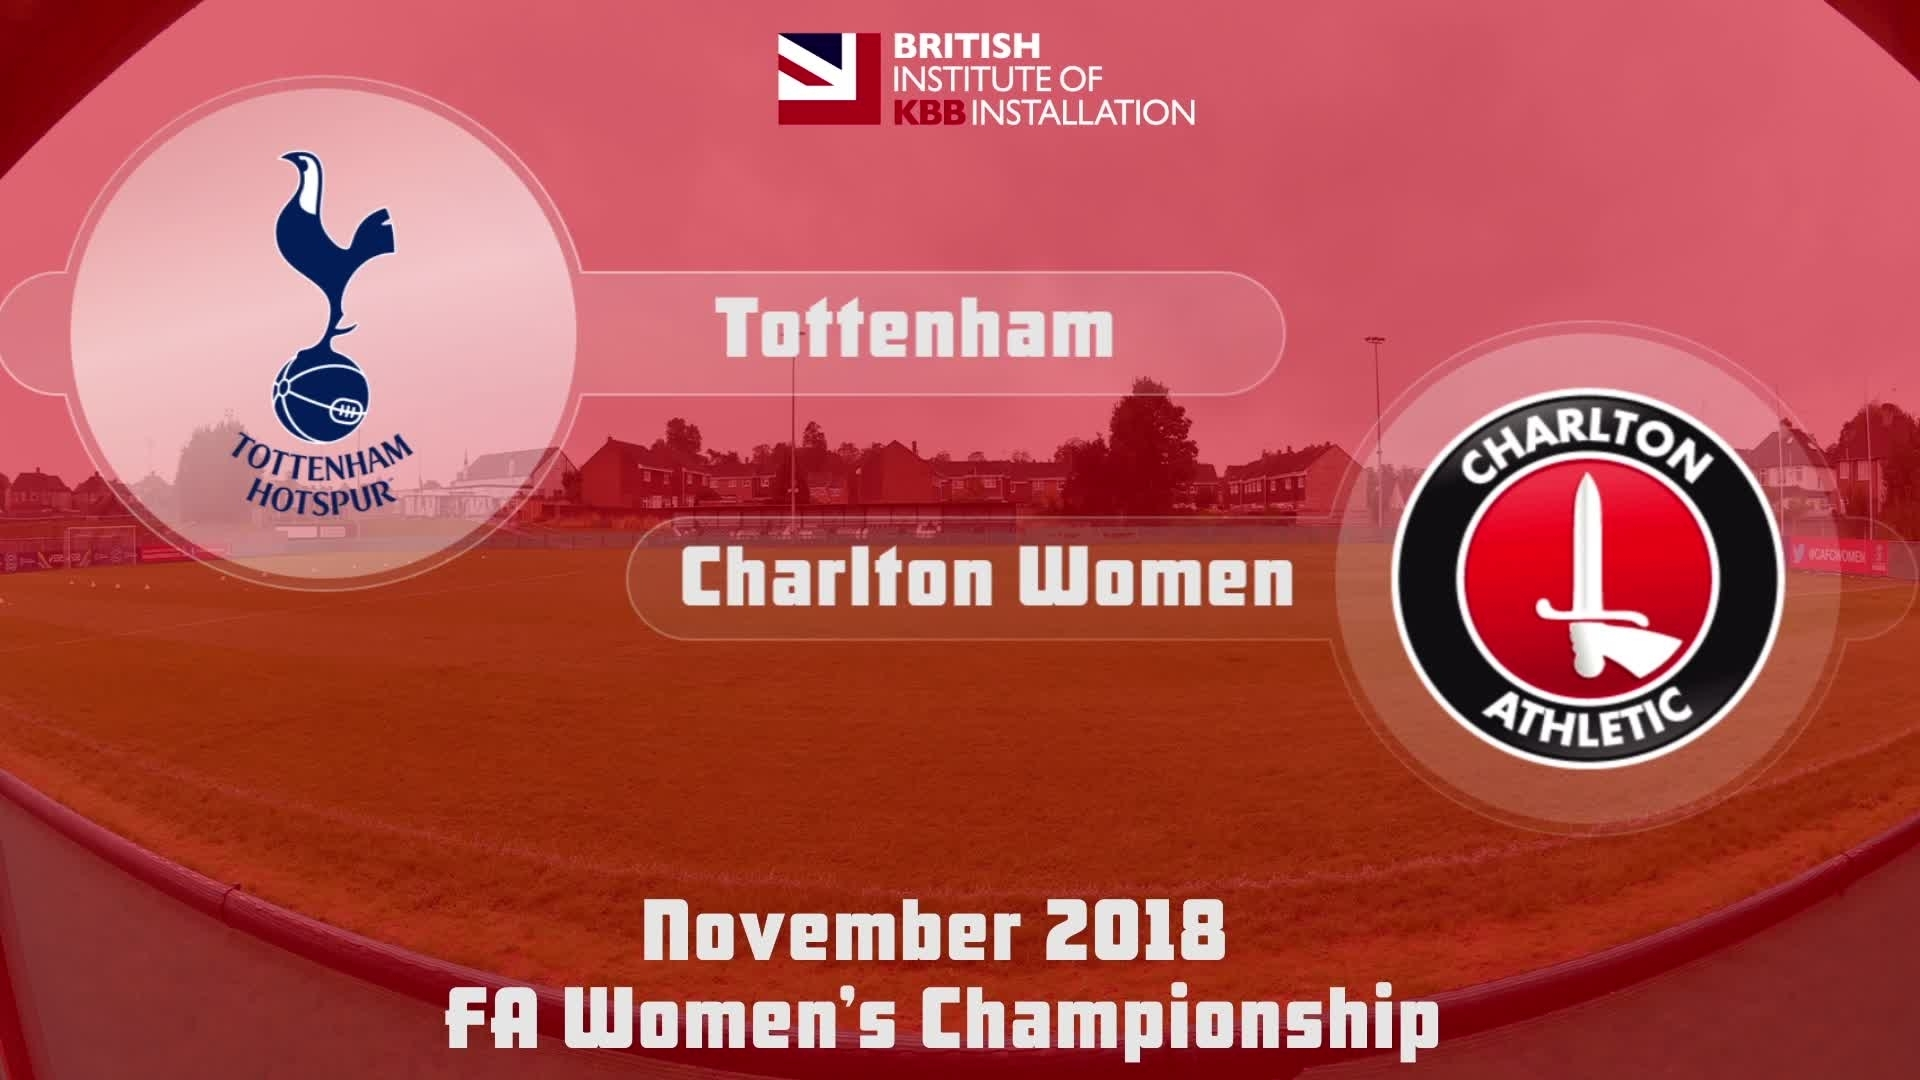 WOMEN HIGHLIGHTS | Tottenham 1 Charlton 0 (Nov 2018)